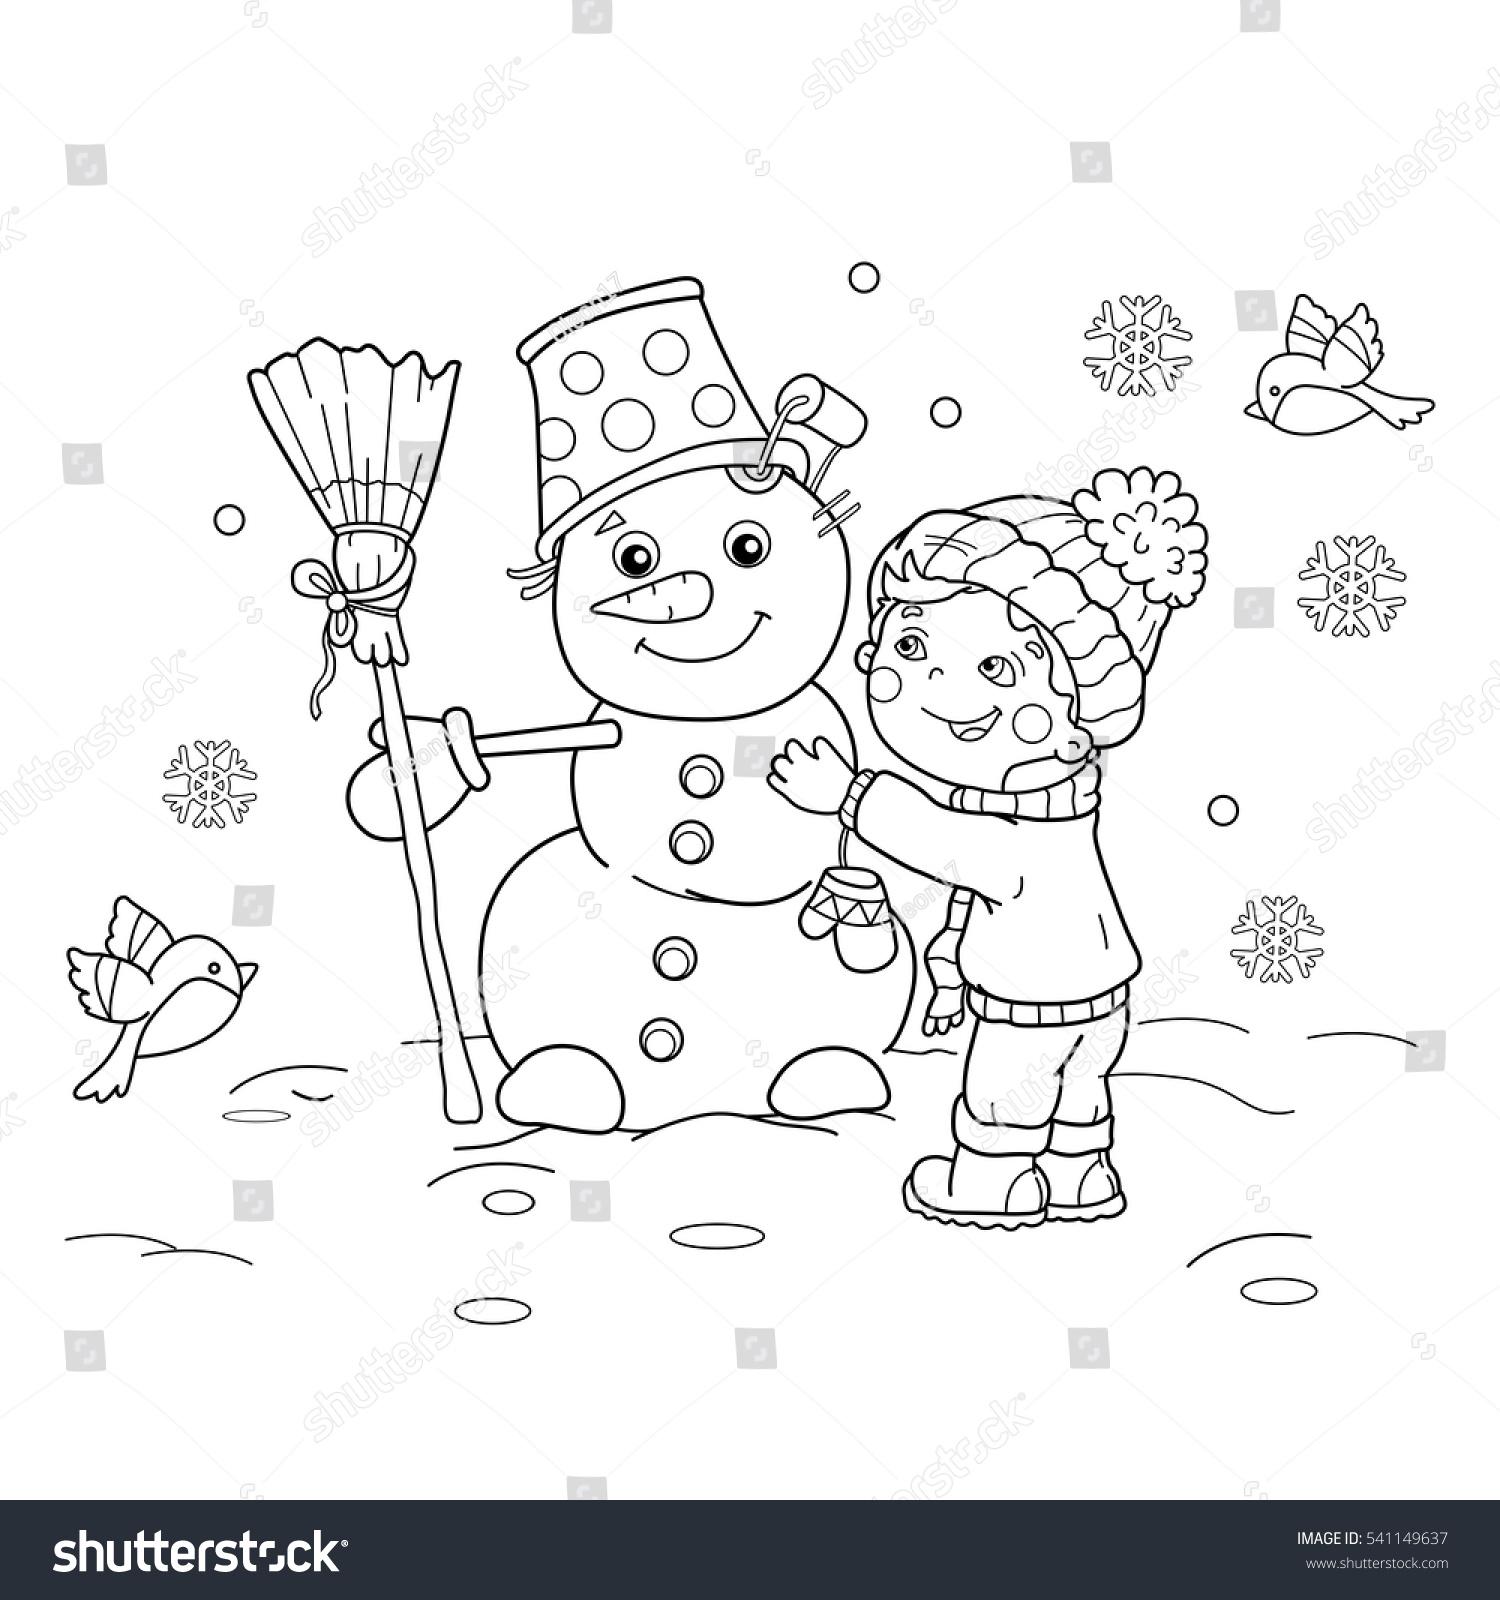 coloring page outline cartoon boy snowman stock vector 541149637